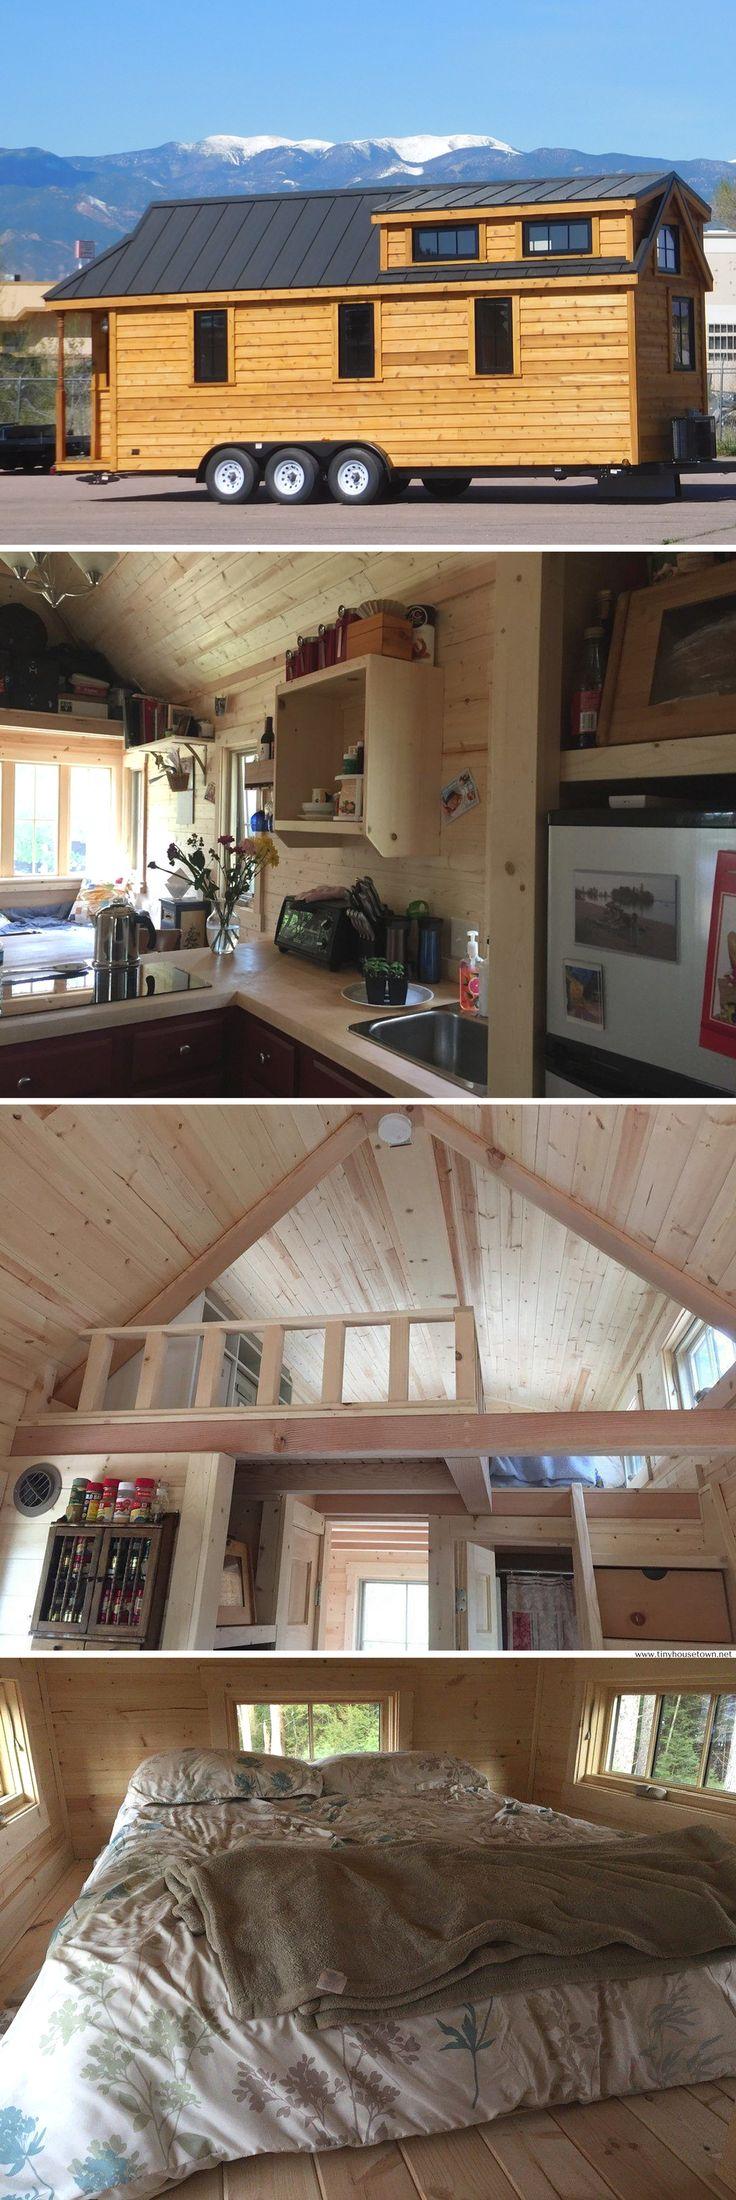 Best 20 tumbleweed homes ideas on pinterest for Tumbleweed tiny house company